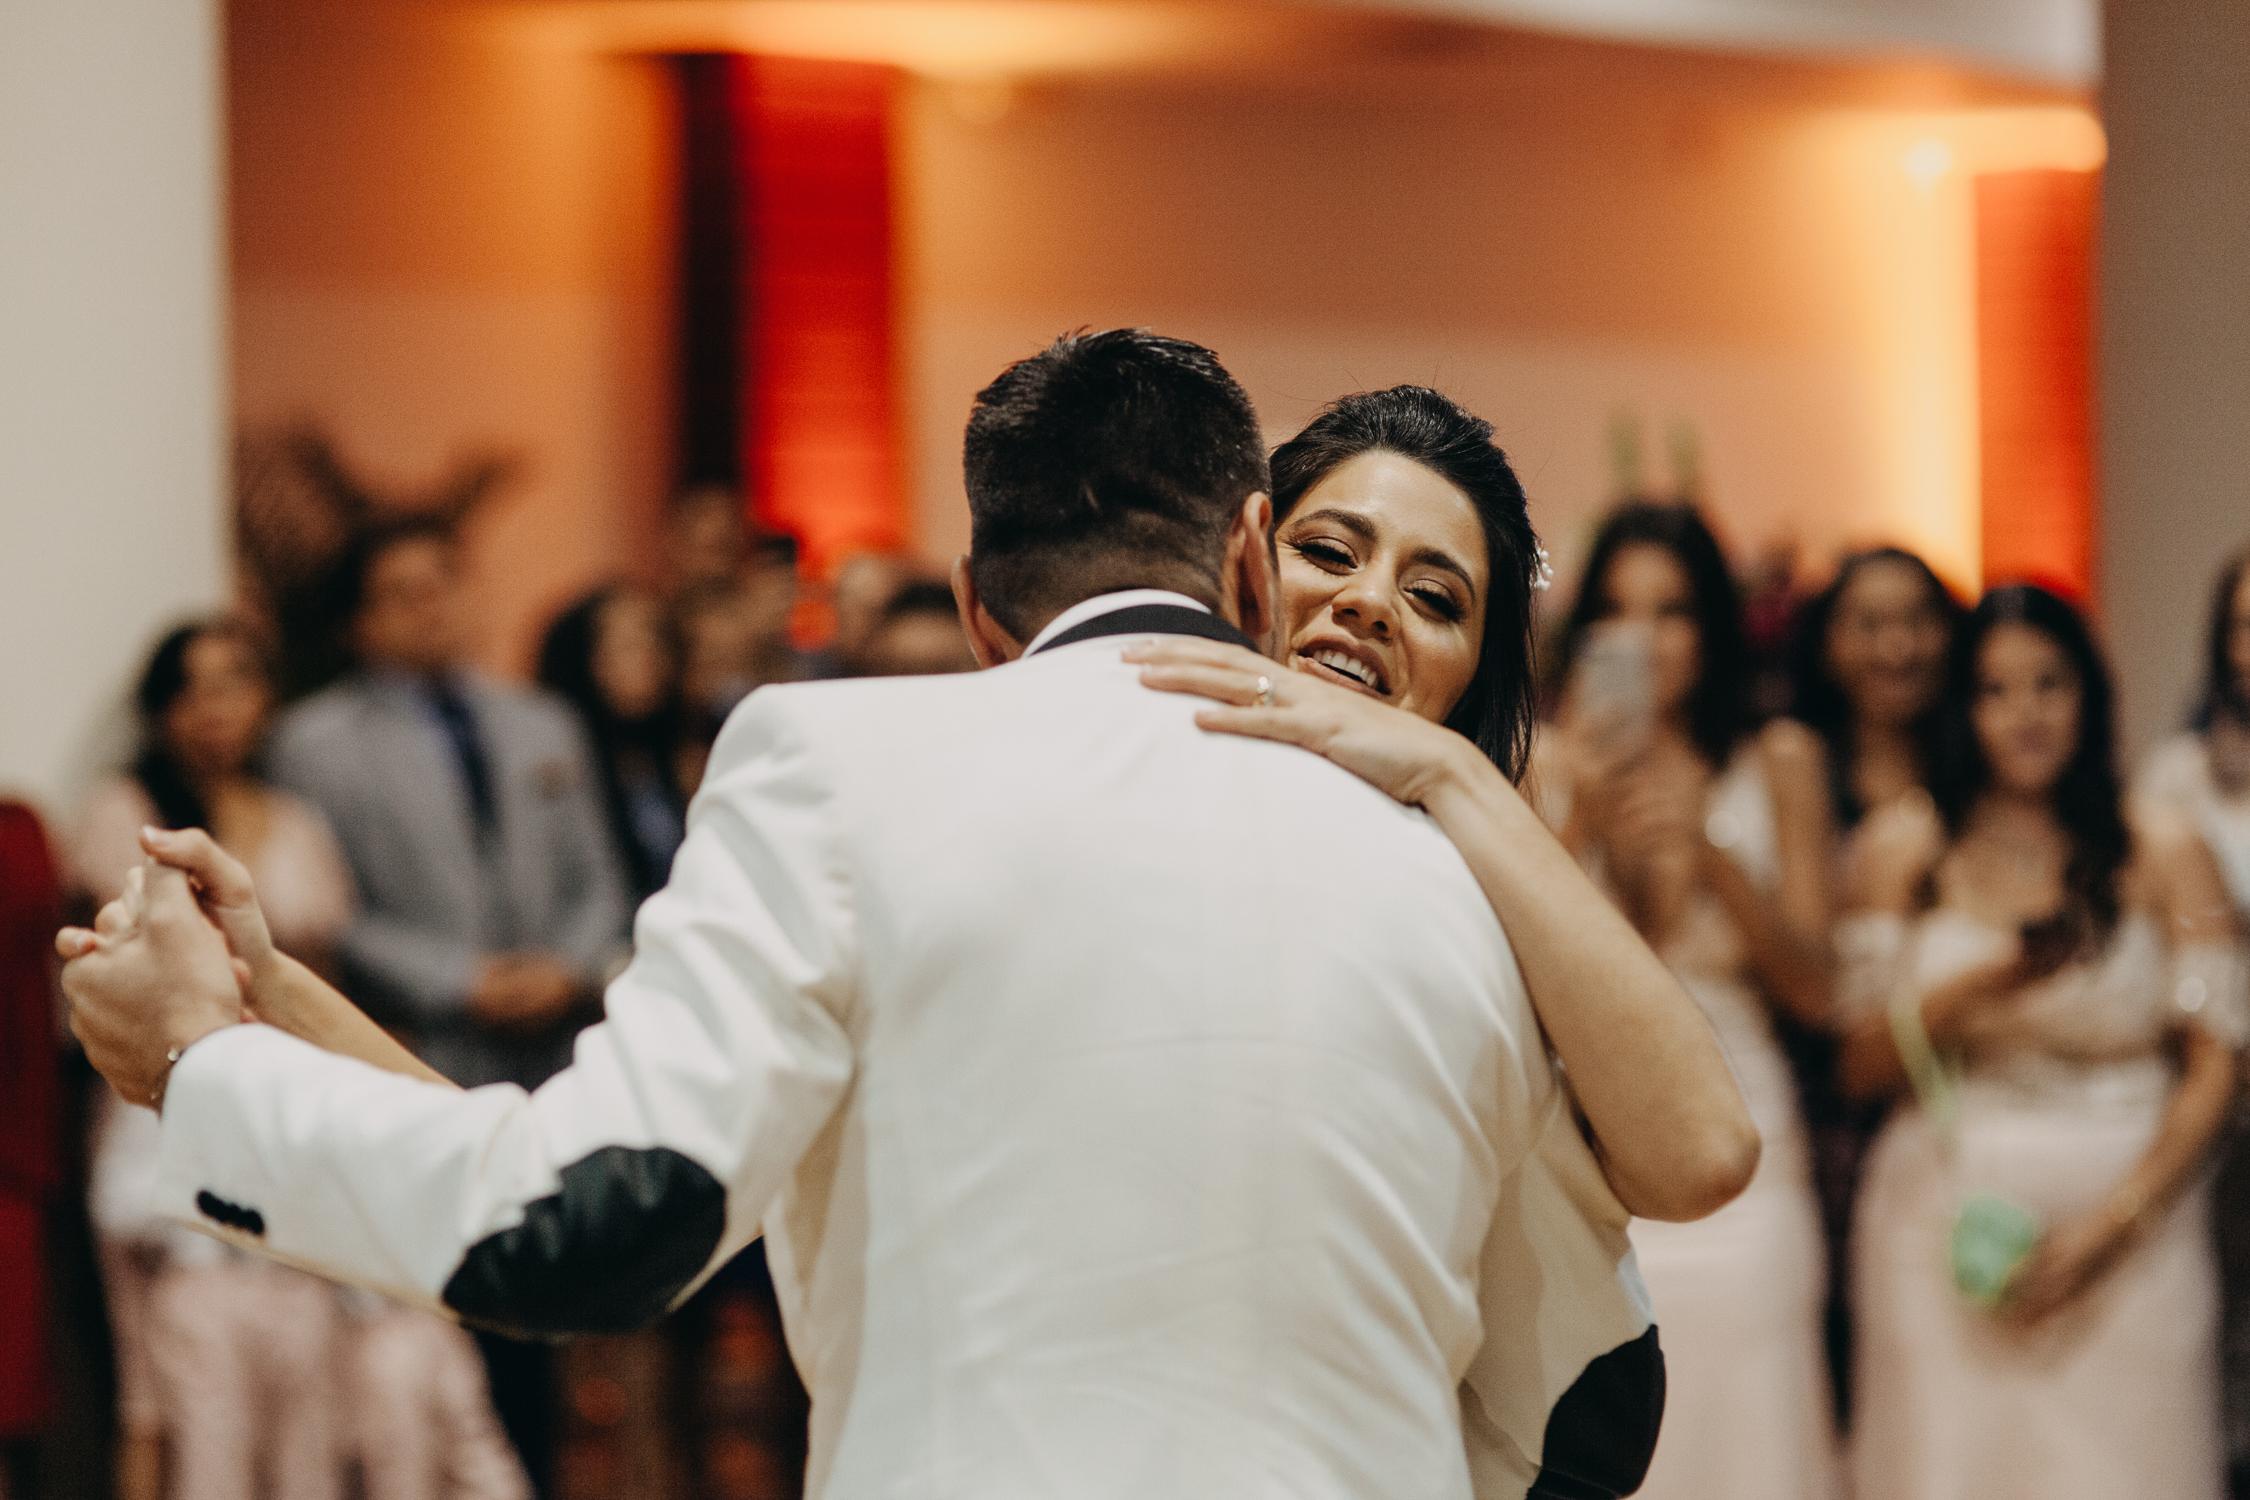 Michelle-Agurto-Fotografia-Bodas-Ecuador-Destination-Wedding-Photographer-Daniela-Dirk-53.JPG